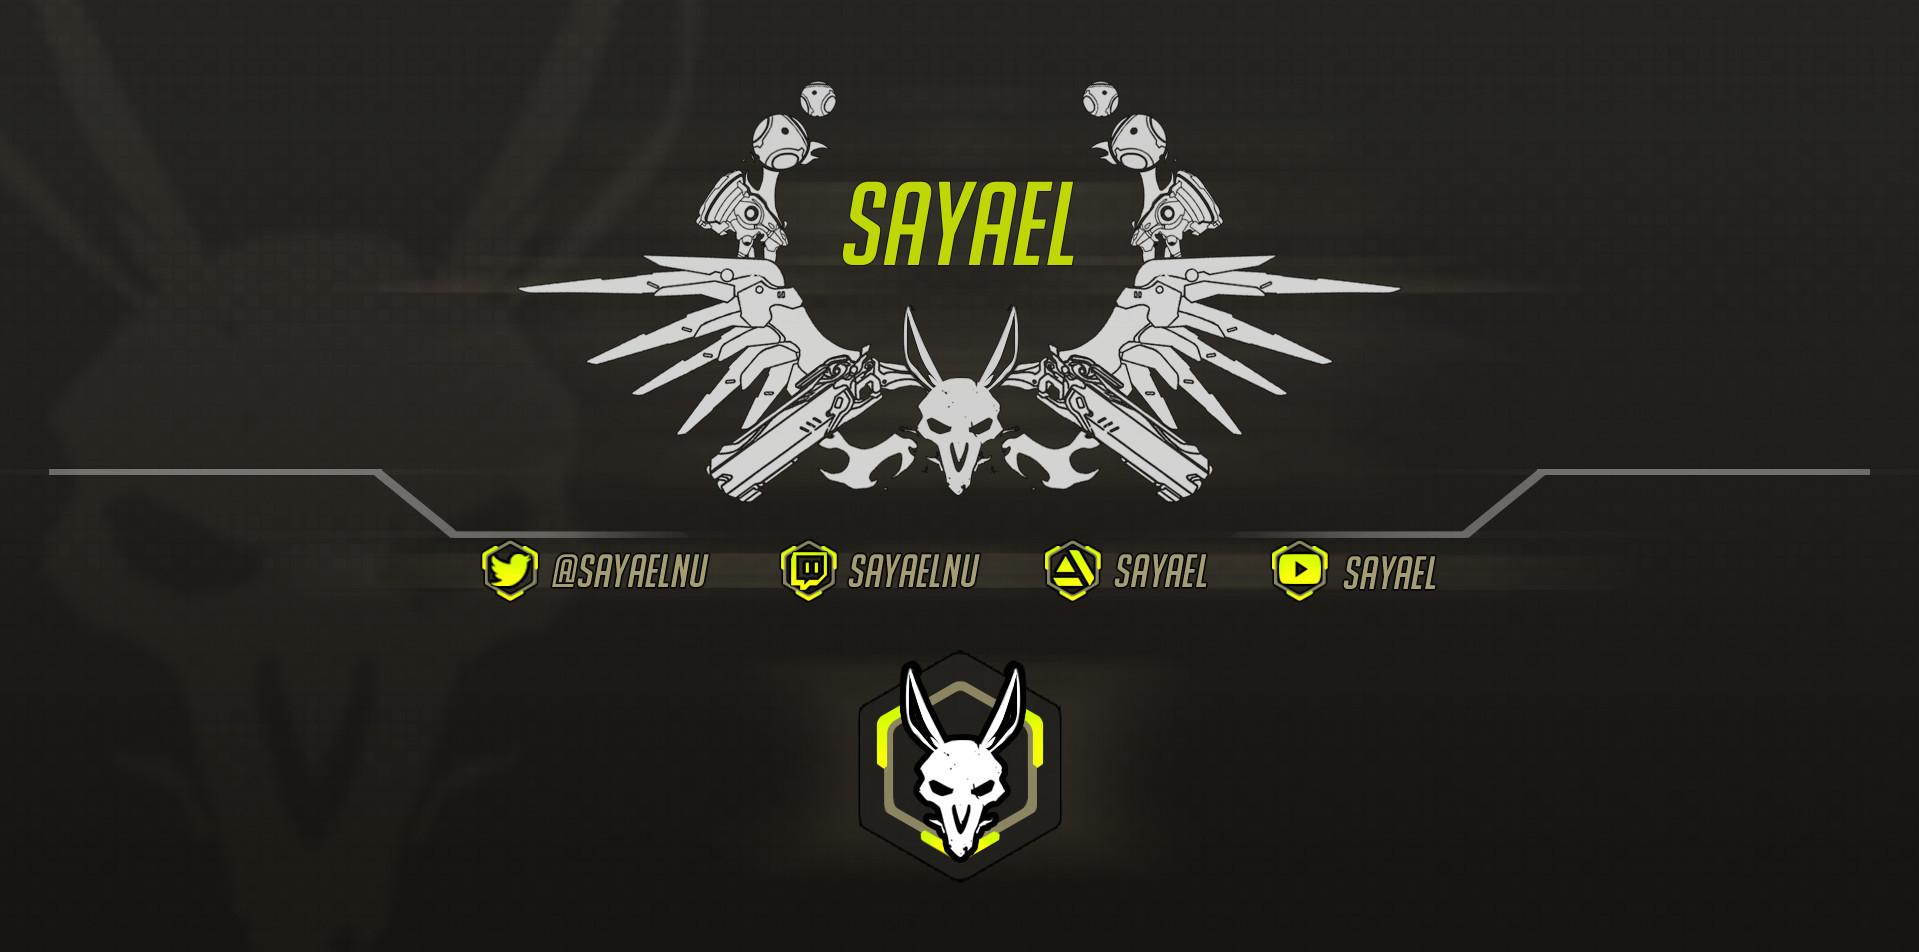 Sayael nu twitchoverlays detail